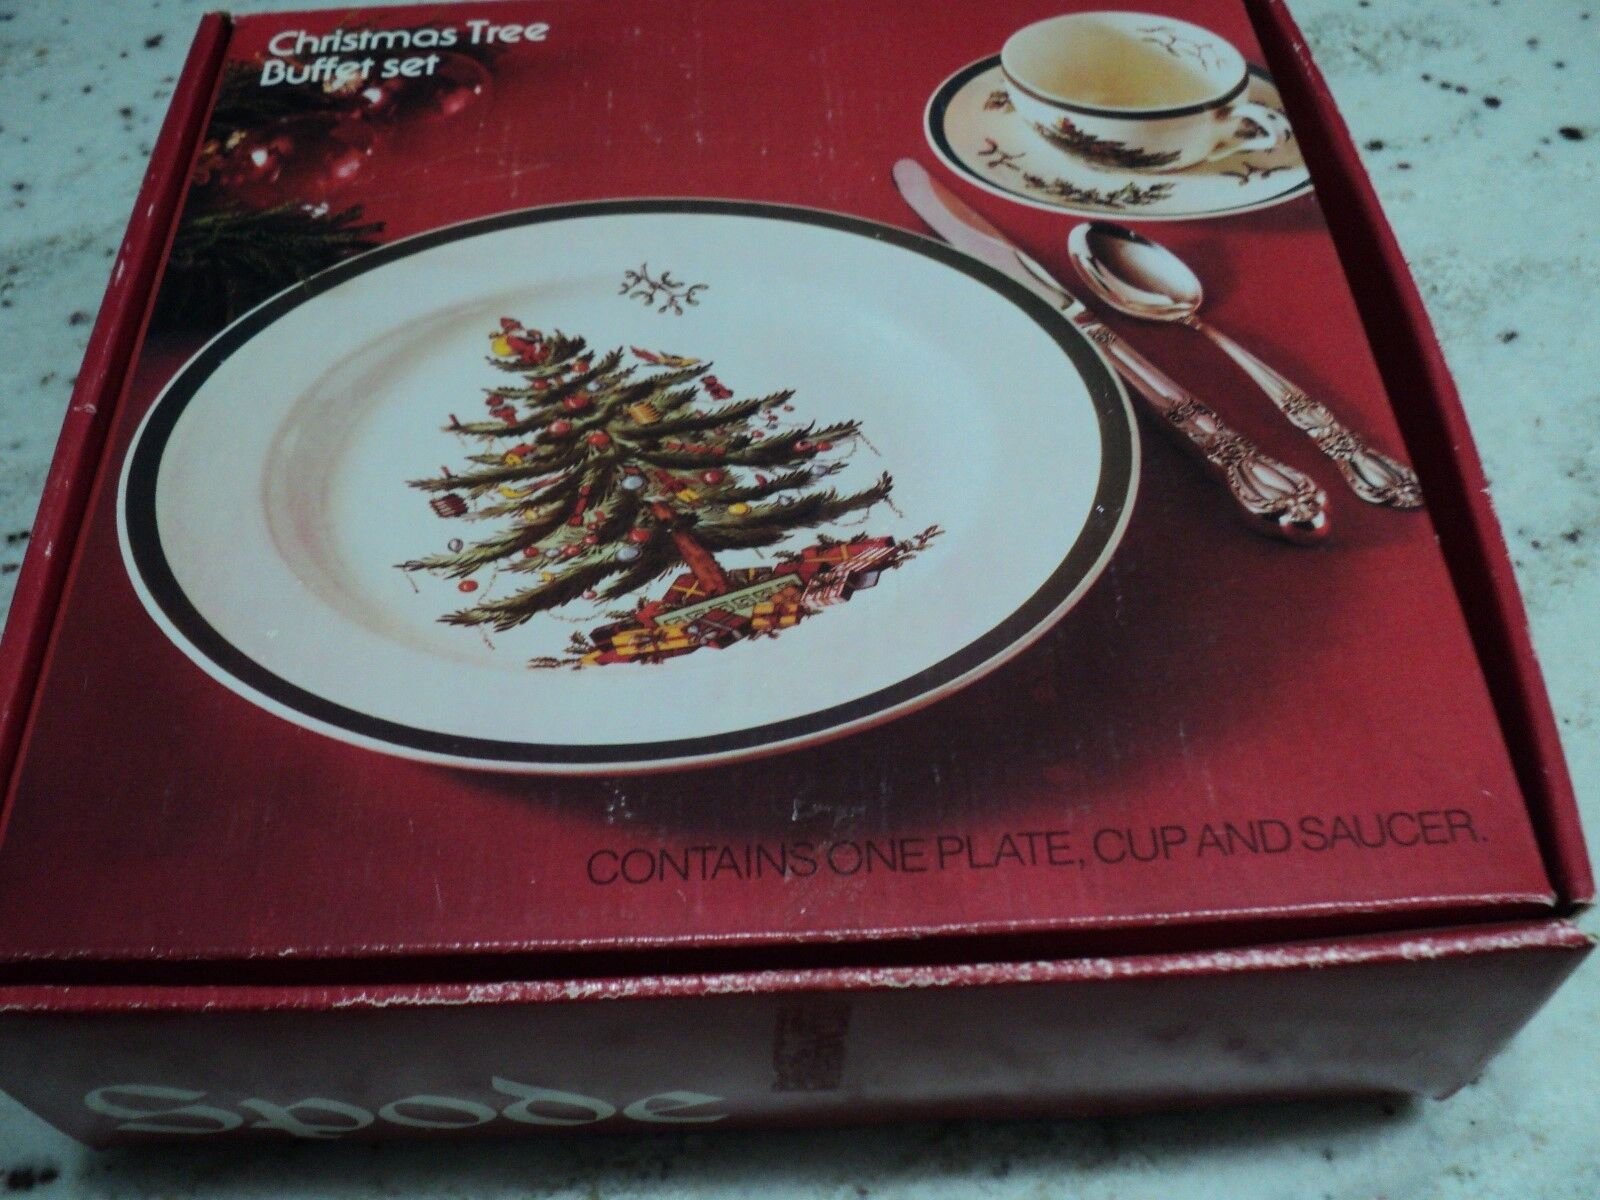 SPODE CHINA ENGLAND CHRISTMAS TREE BUFFET SET 3 PCS MINT IN A BOX  - $18.88